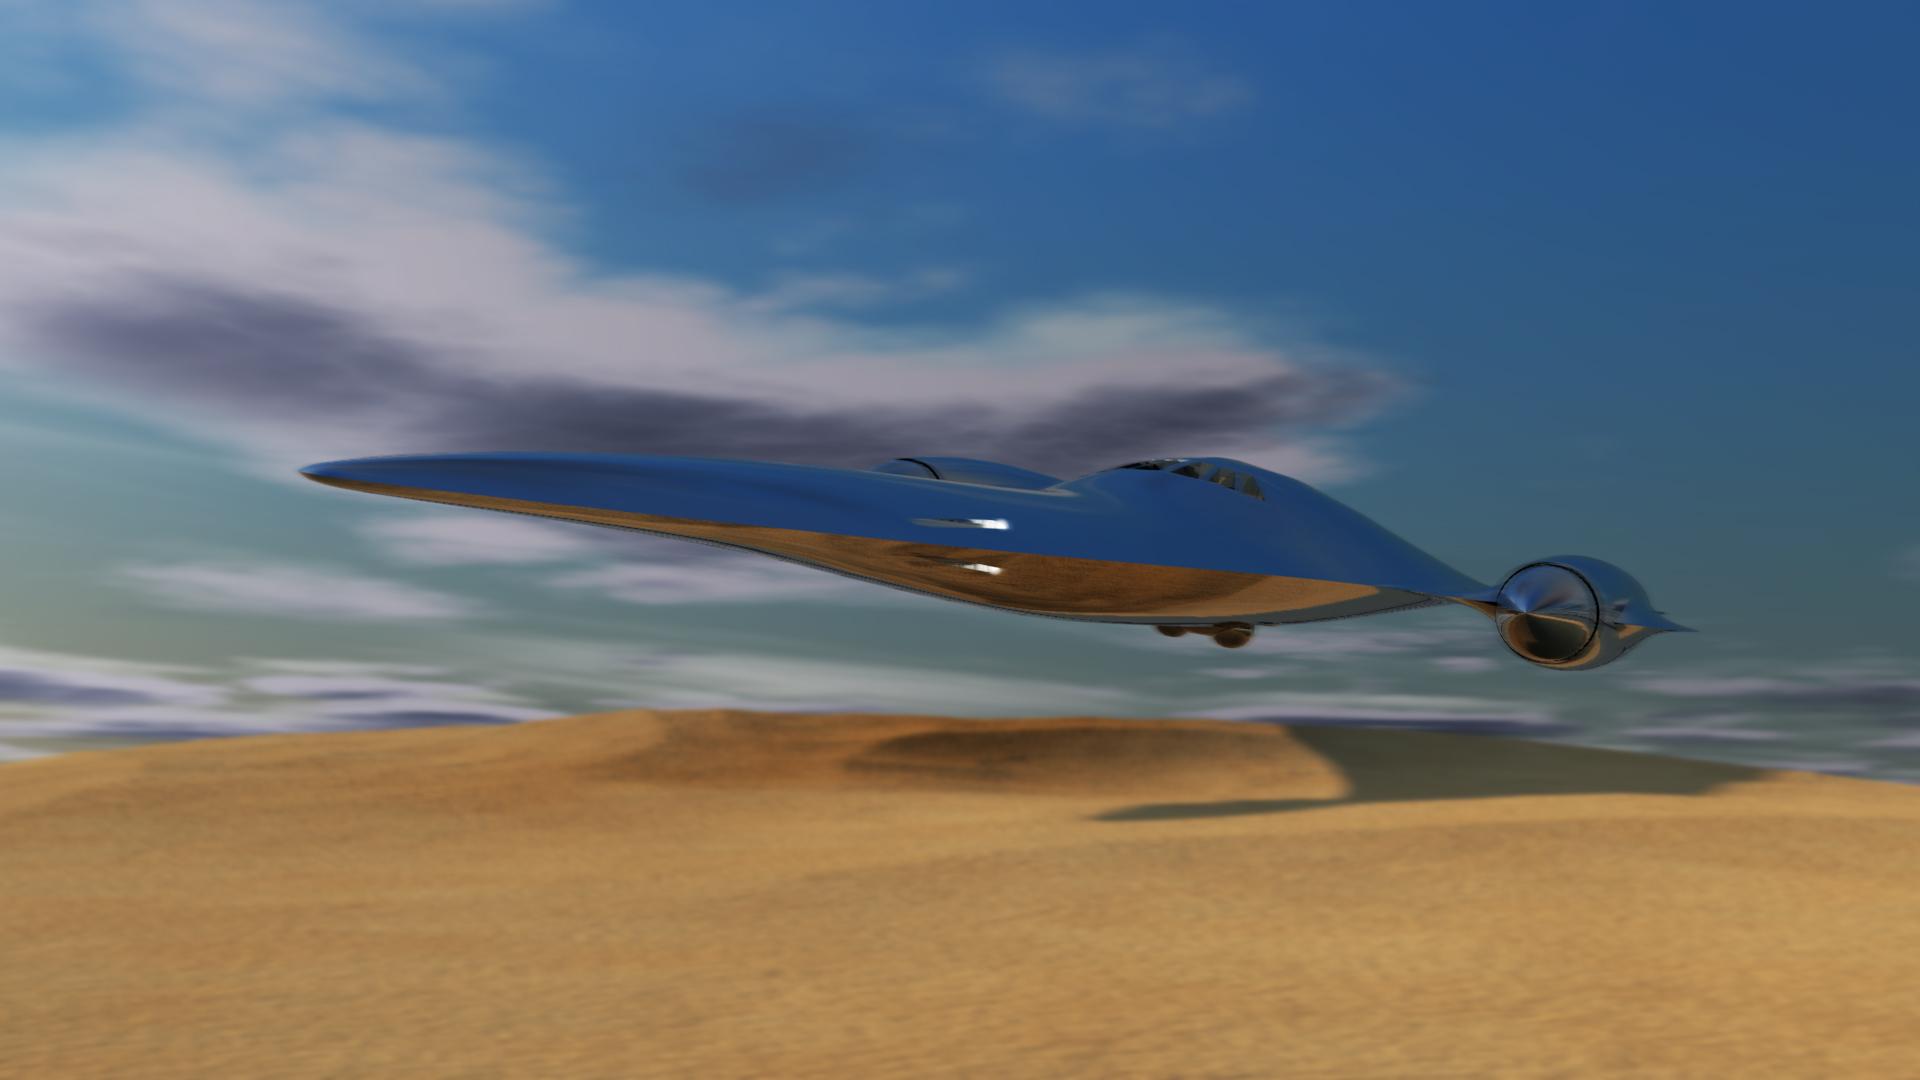 Star Wars Naboo Spaceship Type Nubian By Sorrowda On Deviantart